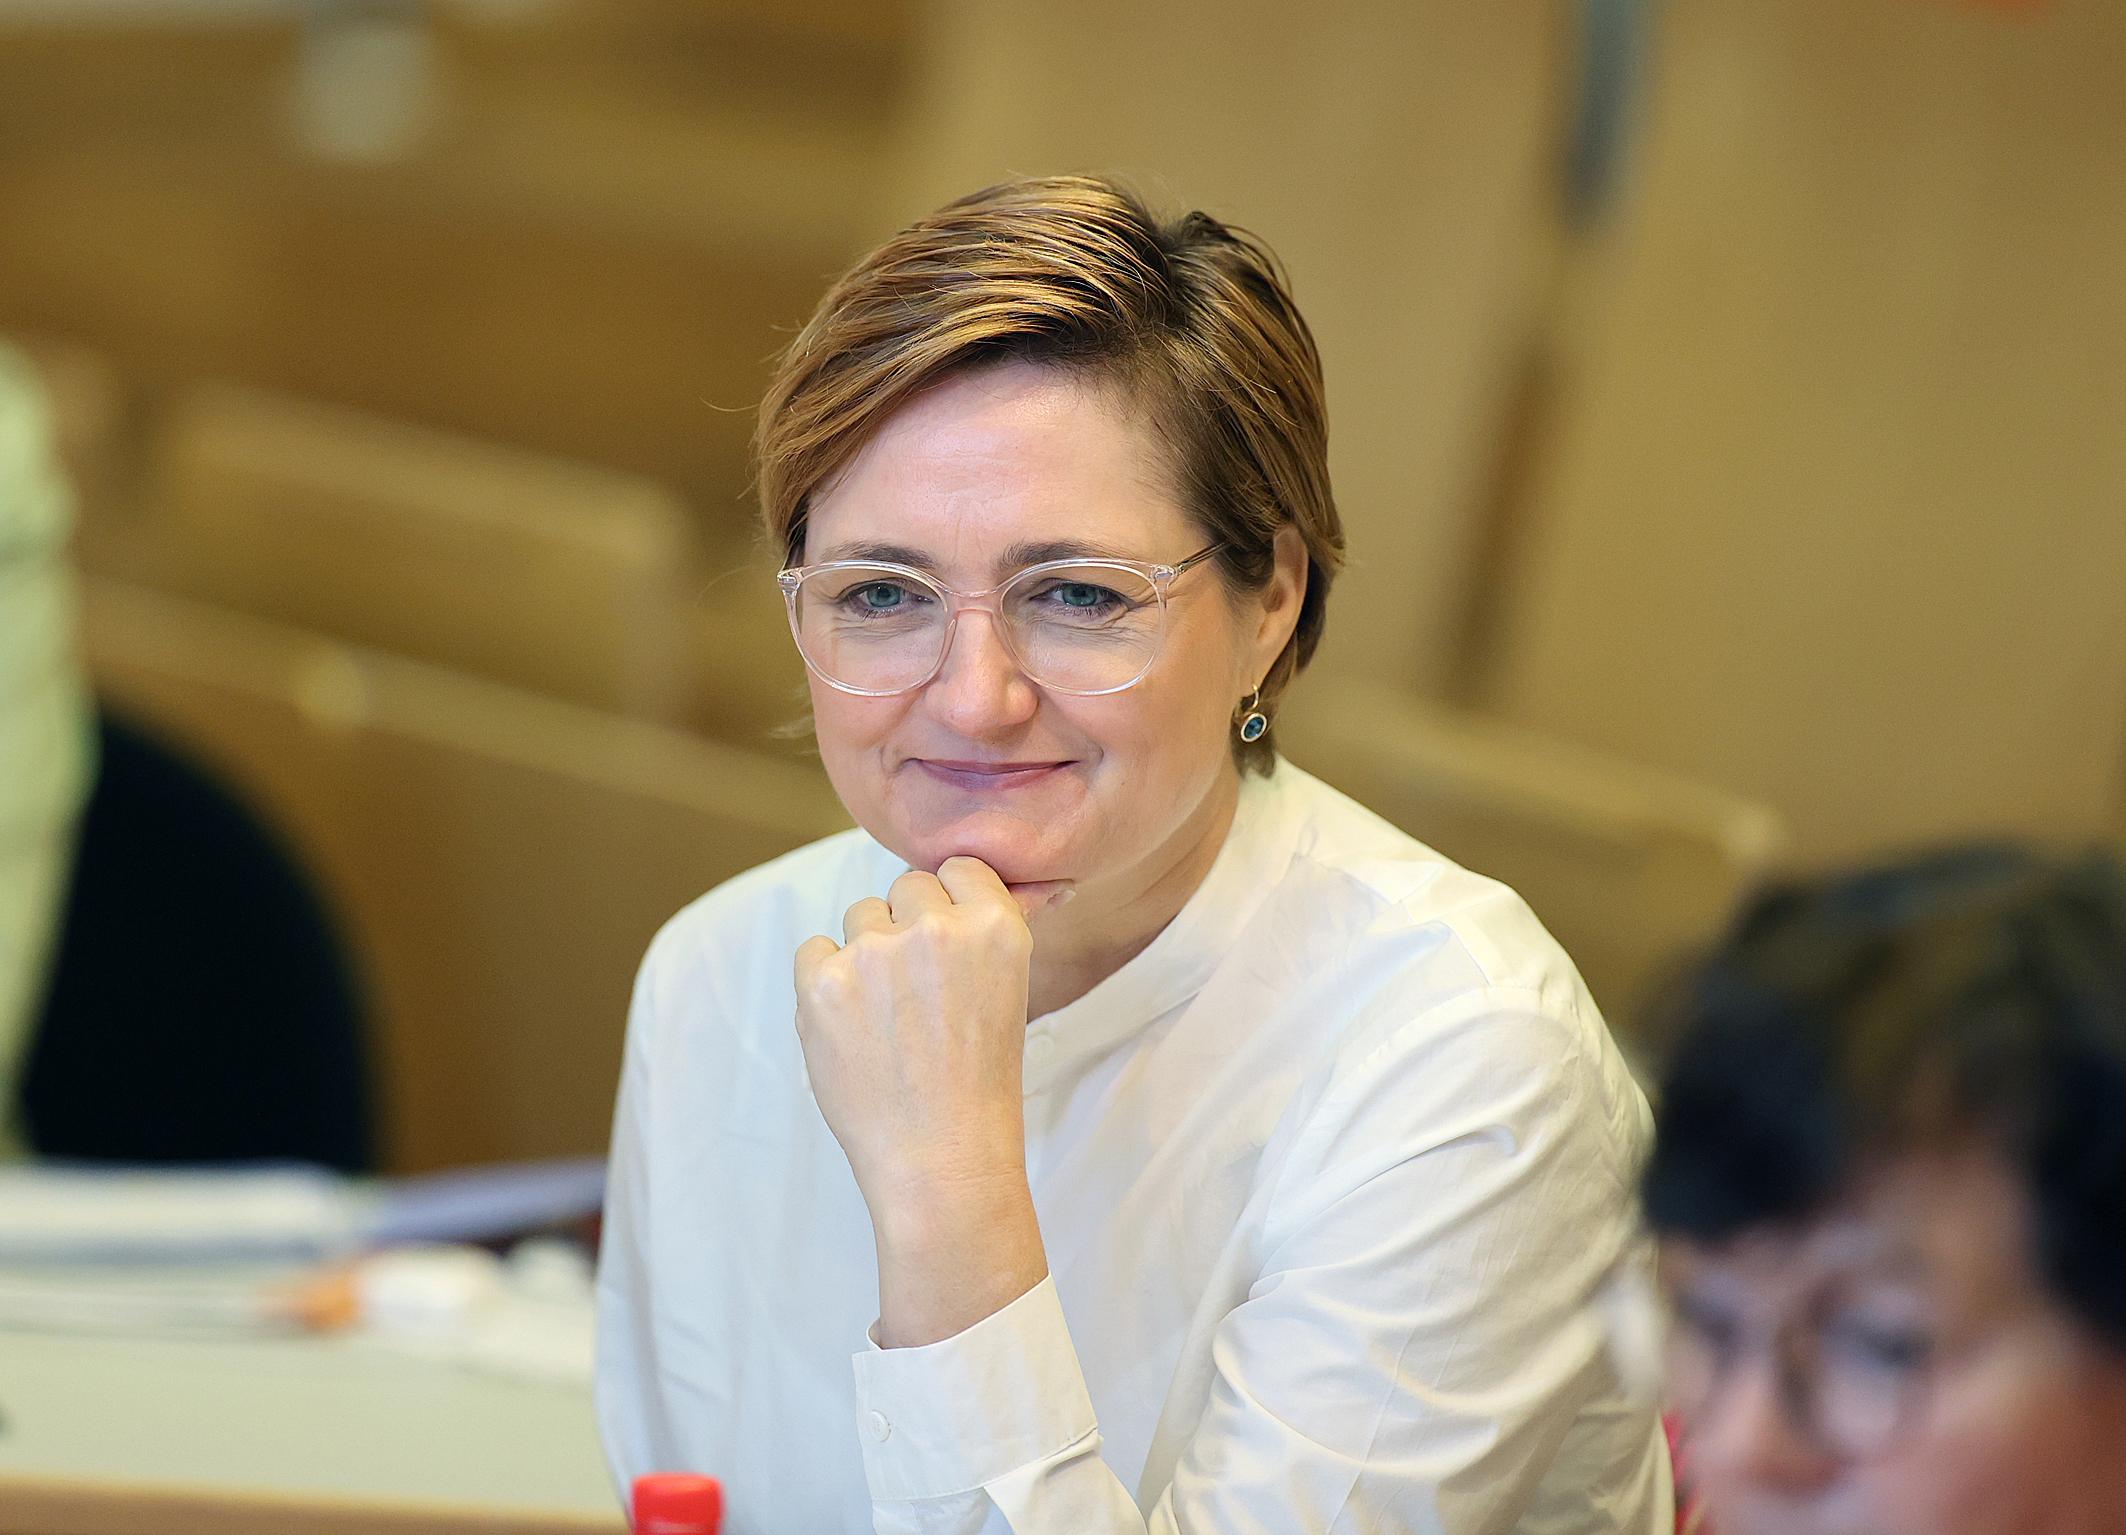 30.08.2021 Eröffnung Oberbürgermeisterin Simone Lange